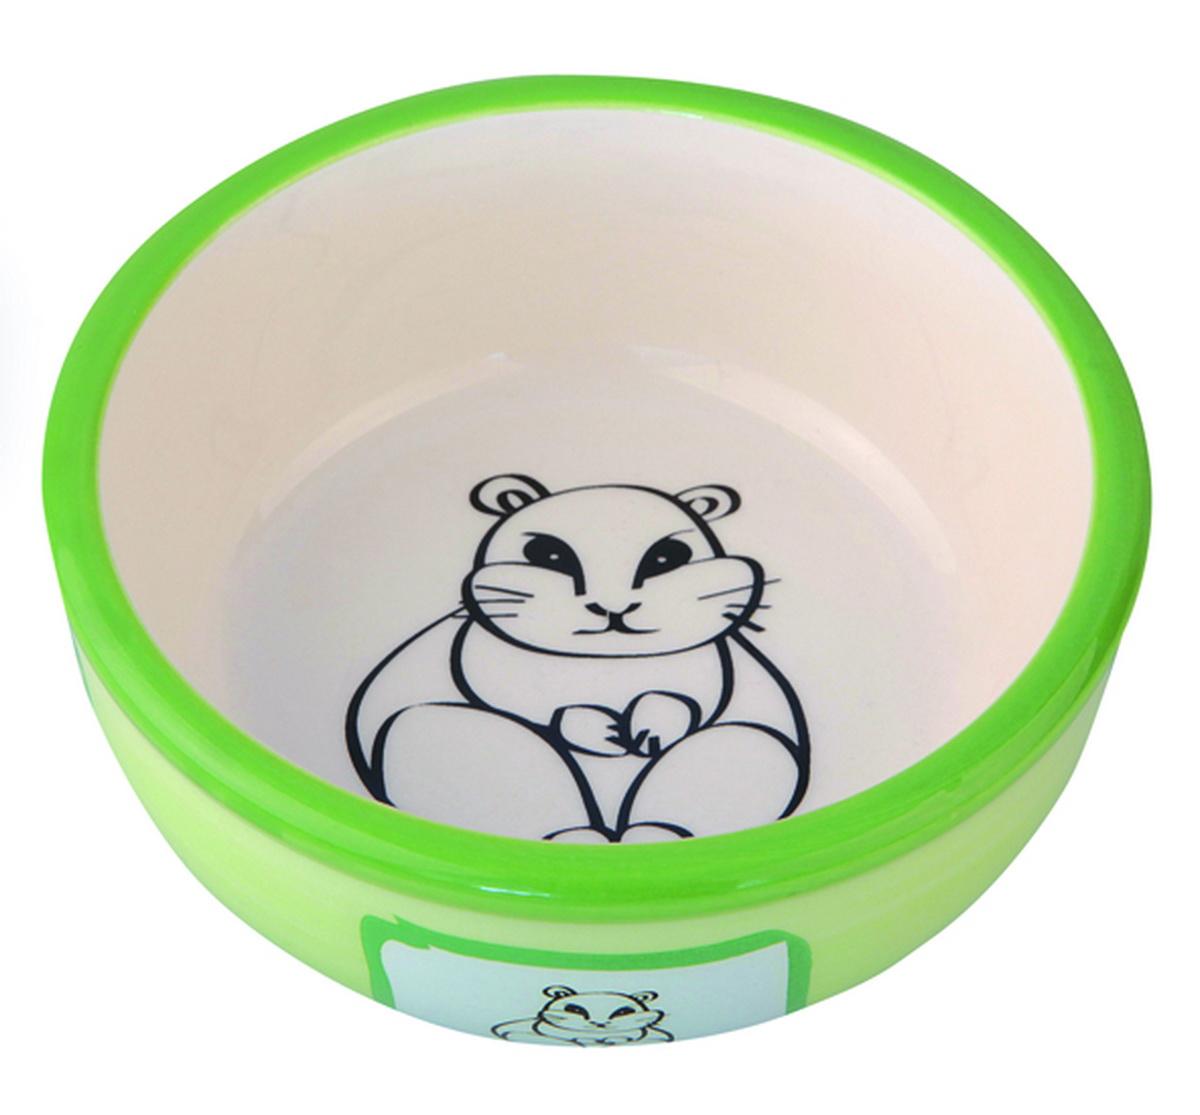 Миска для грызунов Dezzie Хомяк, 200 мл миска на подставке для кошек dezzie дуга